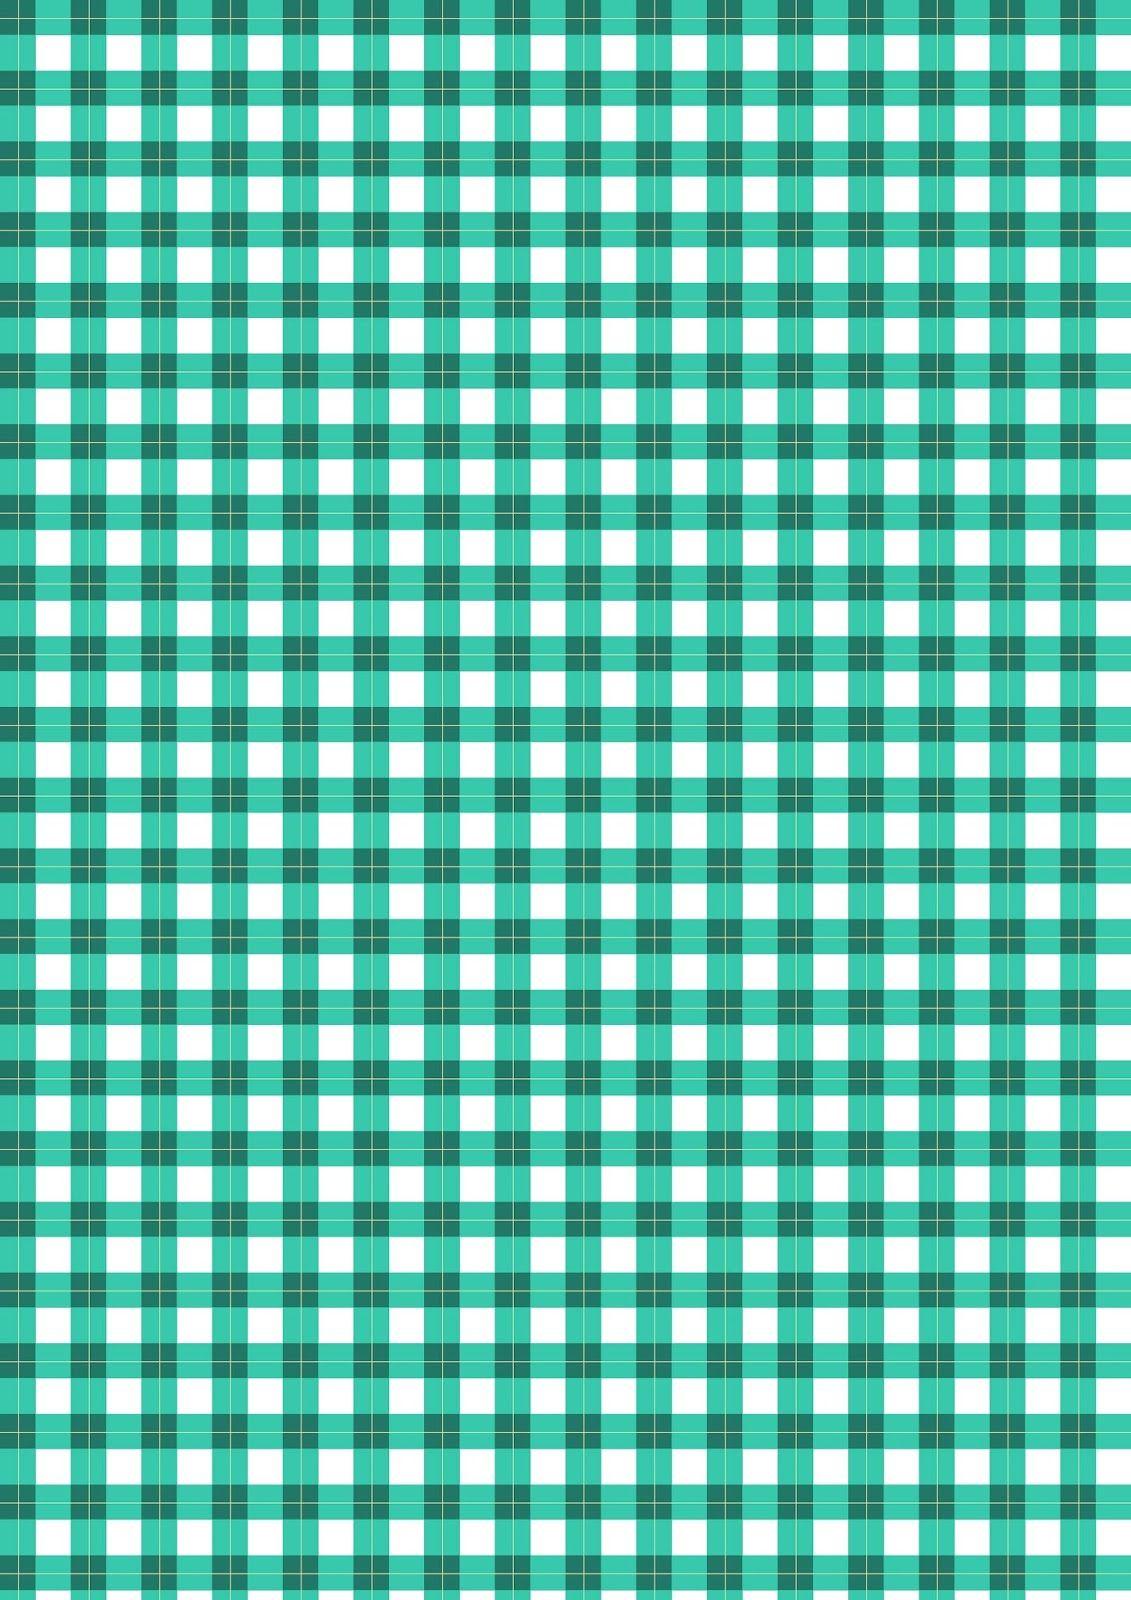 Green Gingham Scrapbook Paper Bulk Scrapbook Paper 12x12 13 Images